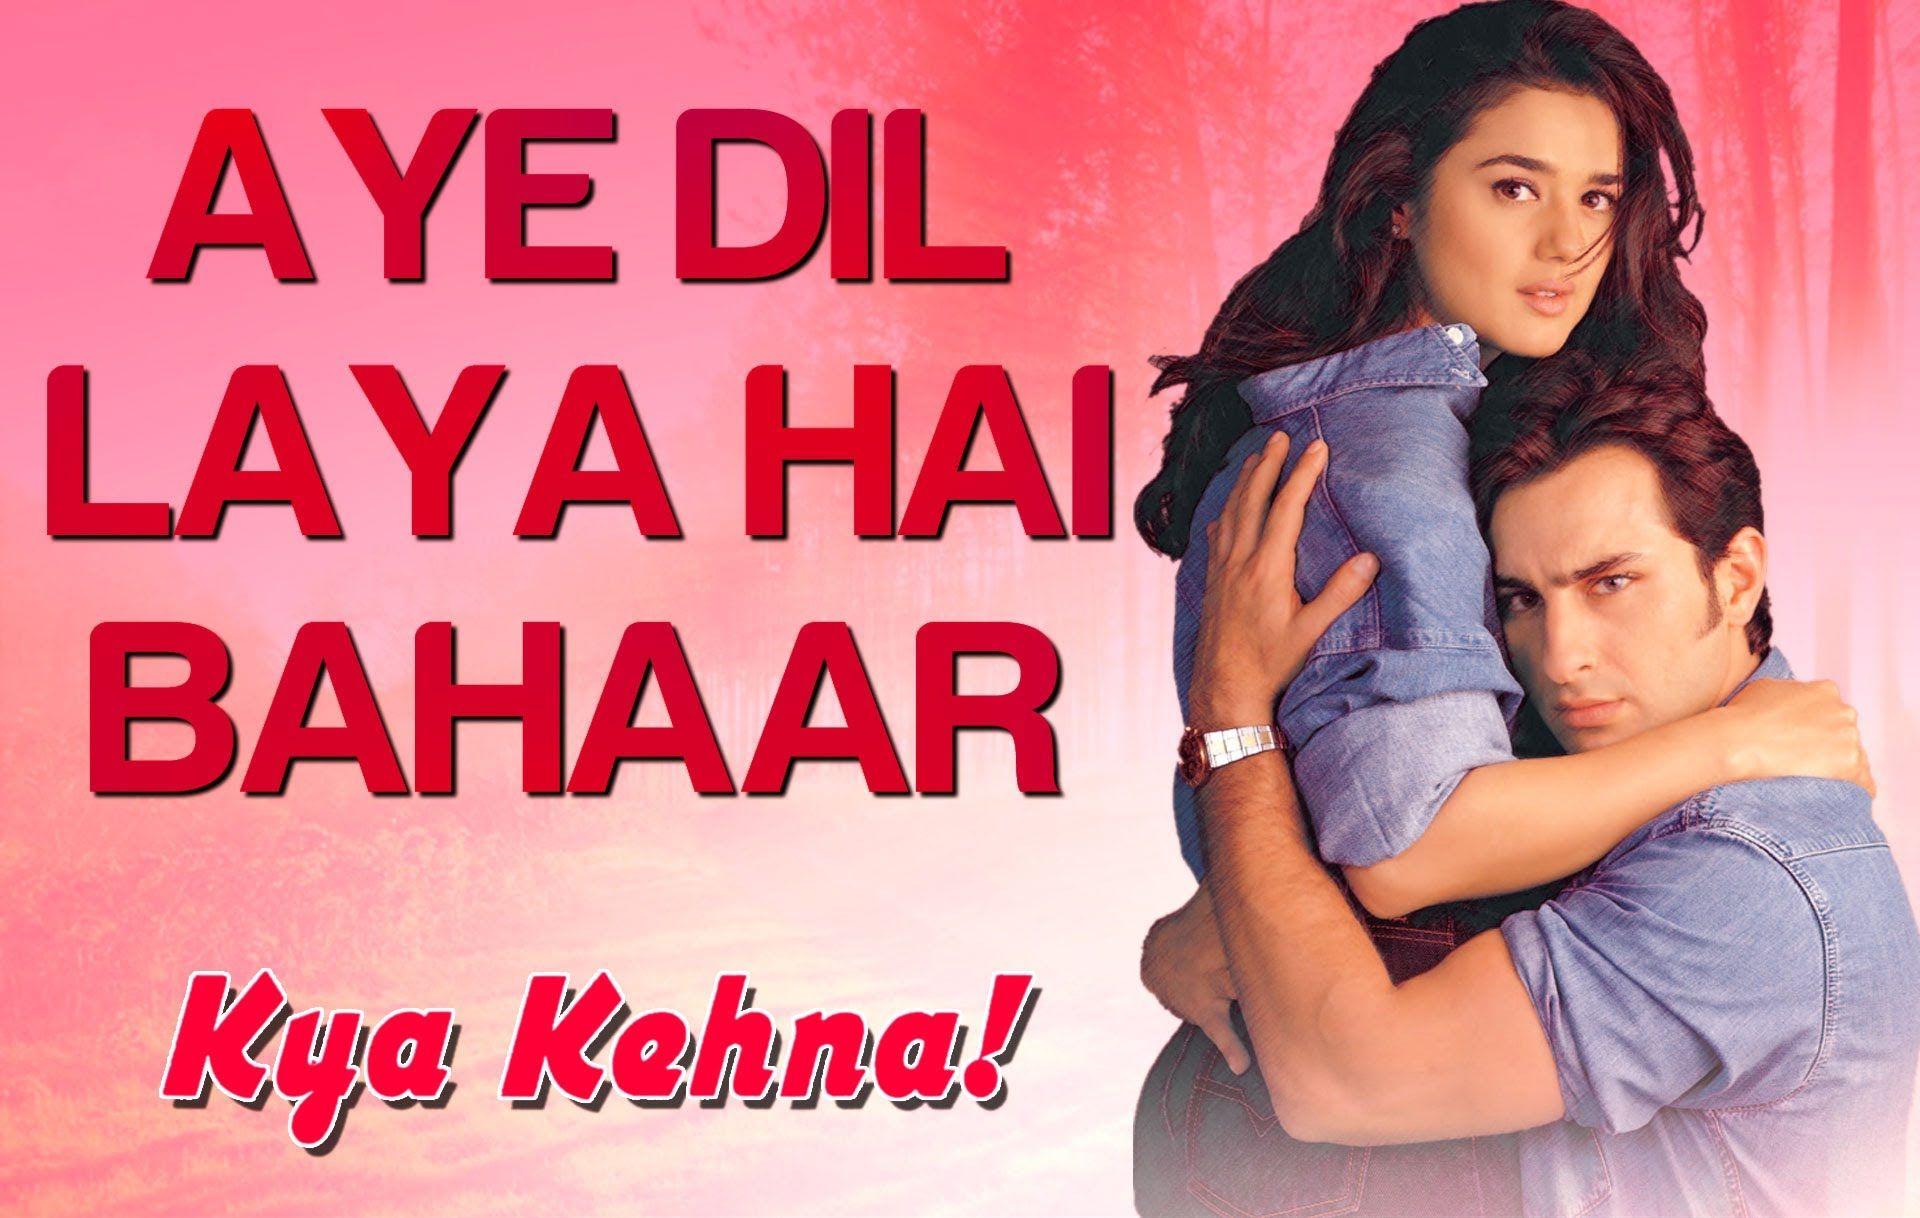 Aye Dil Laya Hai Bahaar Kya Kehna Preity Zinta Kavita Krishnamurthy Hariharan Rajesh Roshan Song Hindi Hindi Movie Song Latest Bollywood Songs